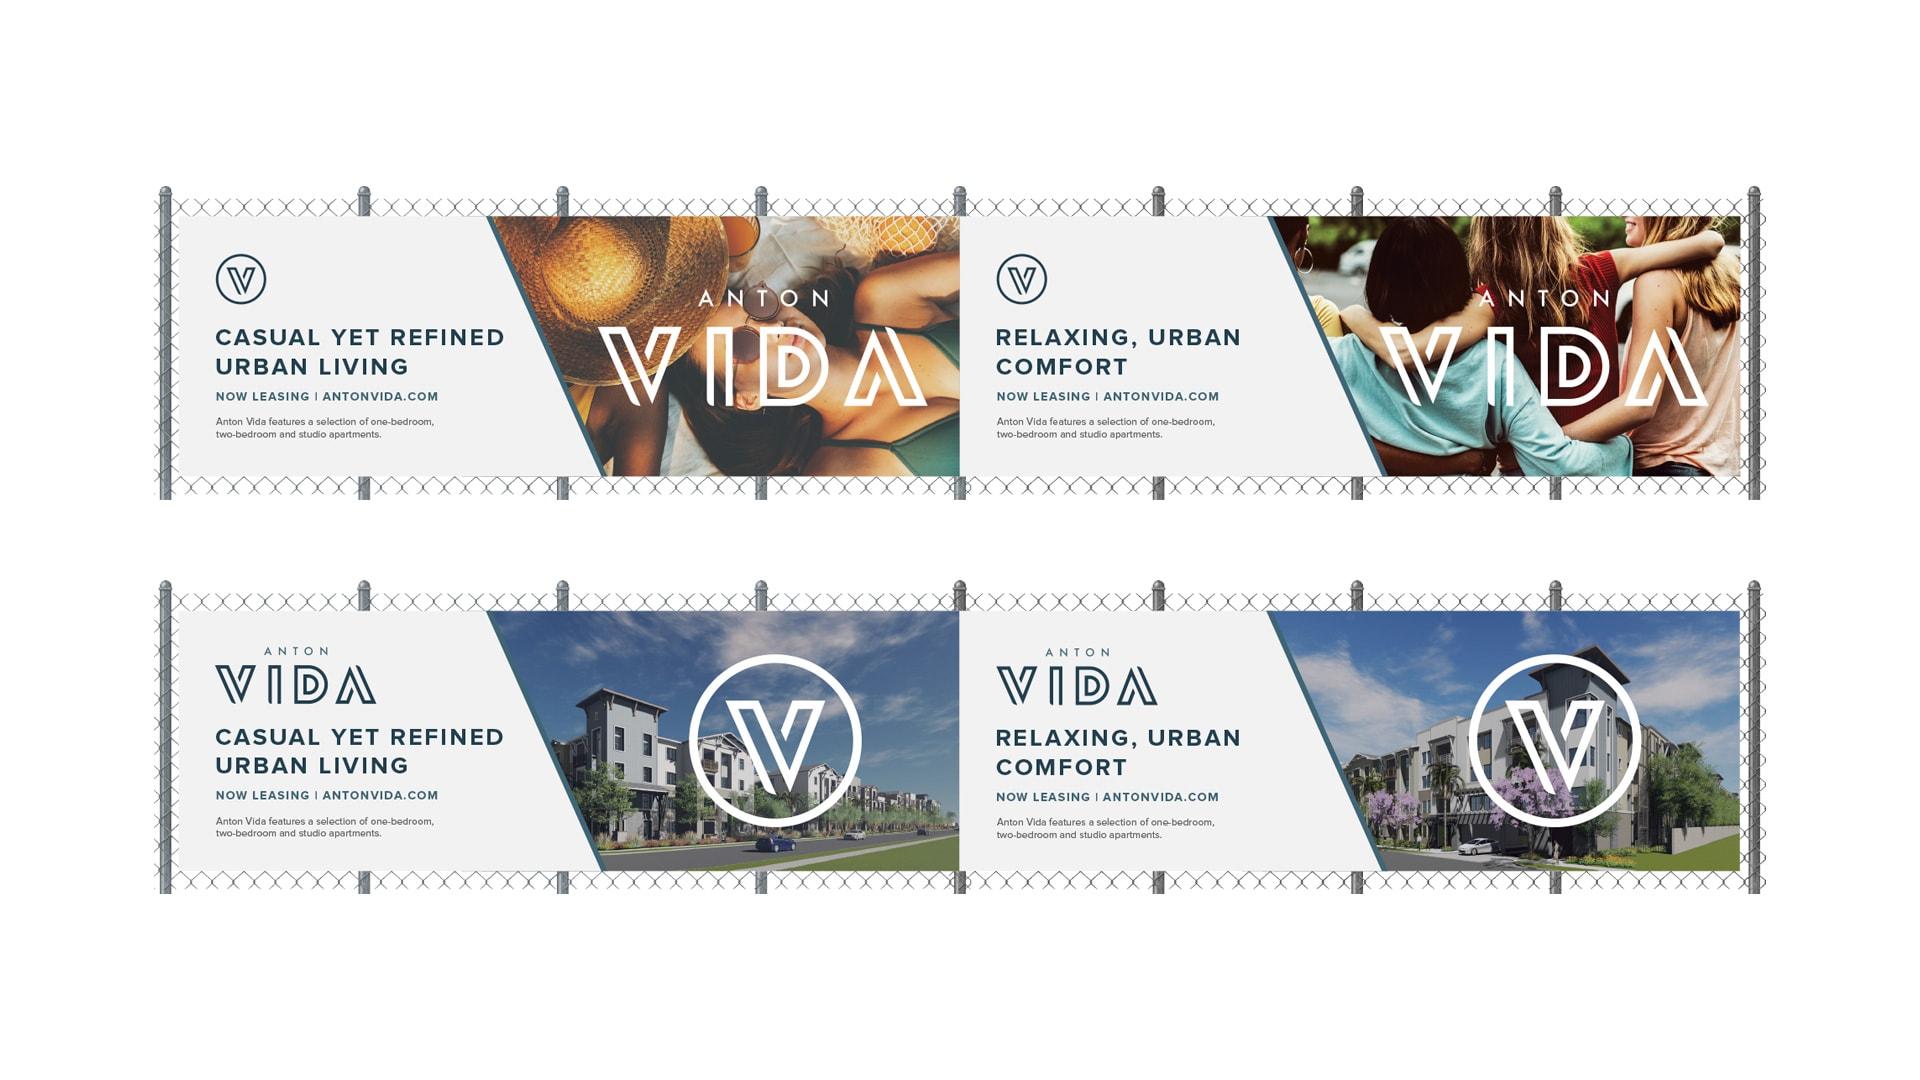 Anton Vida Banner Design - Unsung Studio Branding